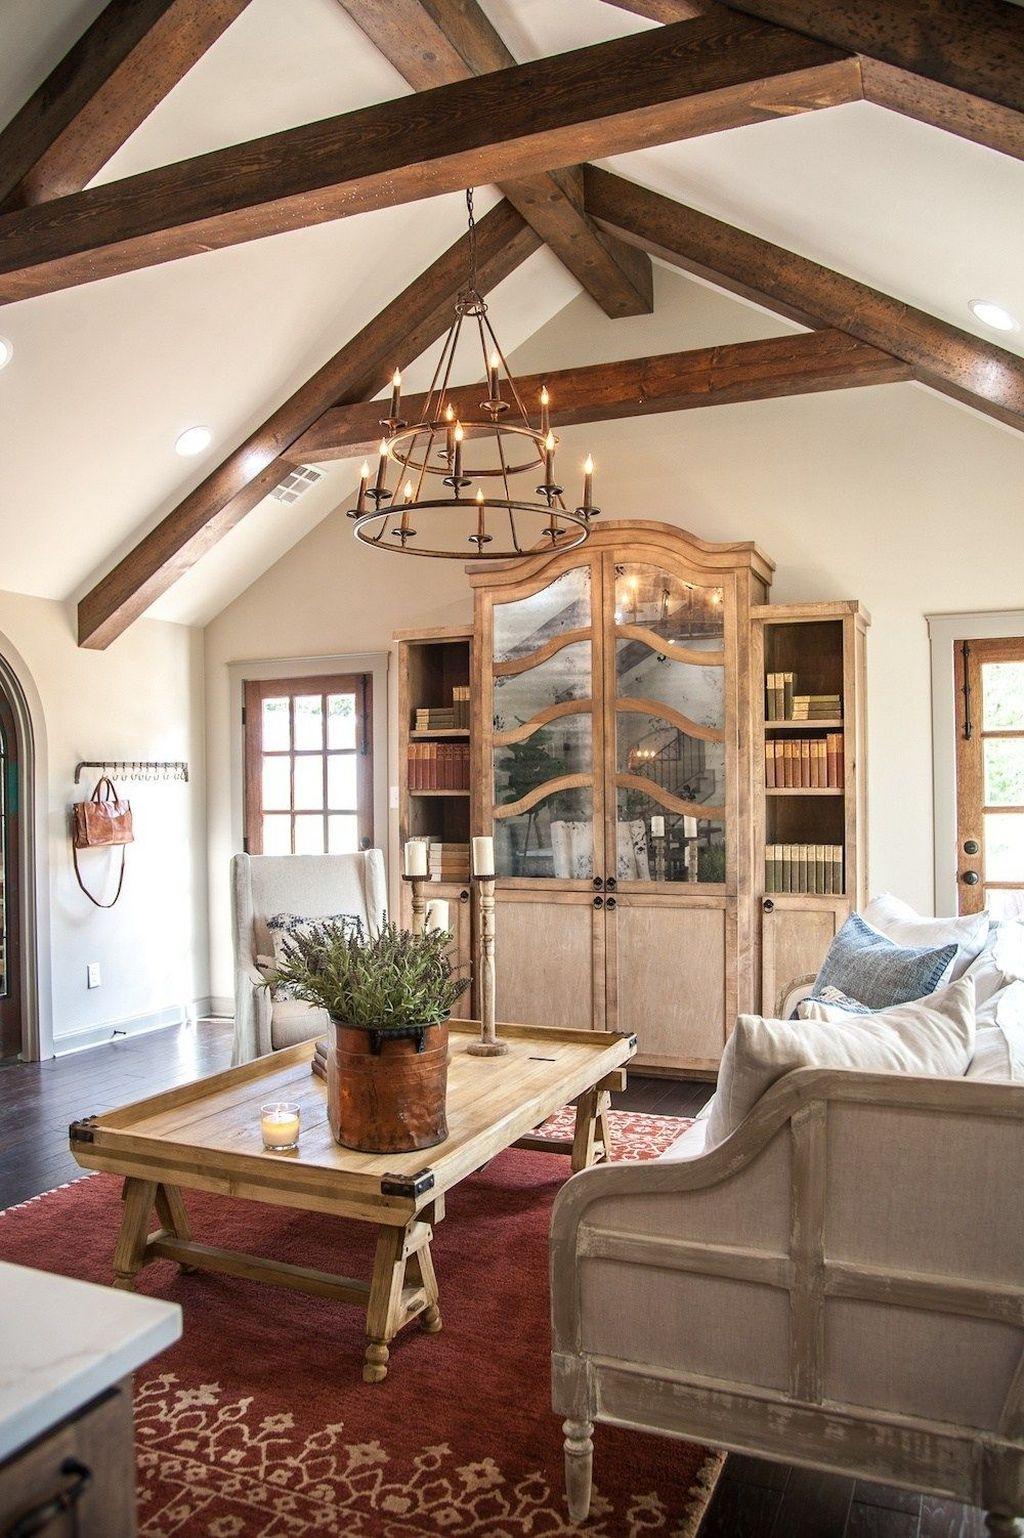 Fabulous Rustic Italian Decor Ideas For Your Home 32